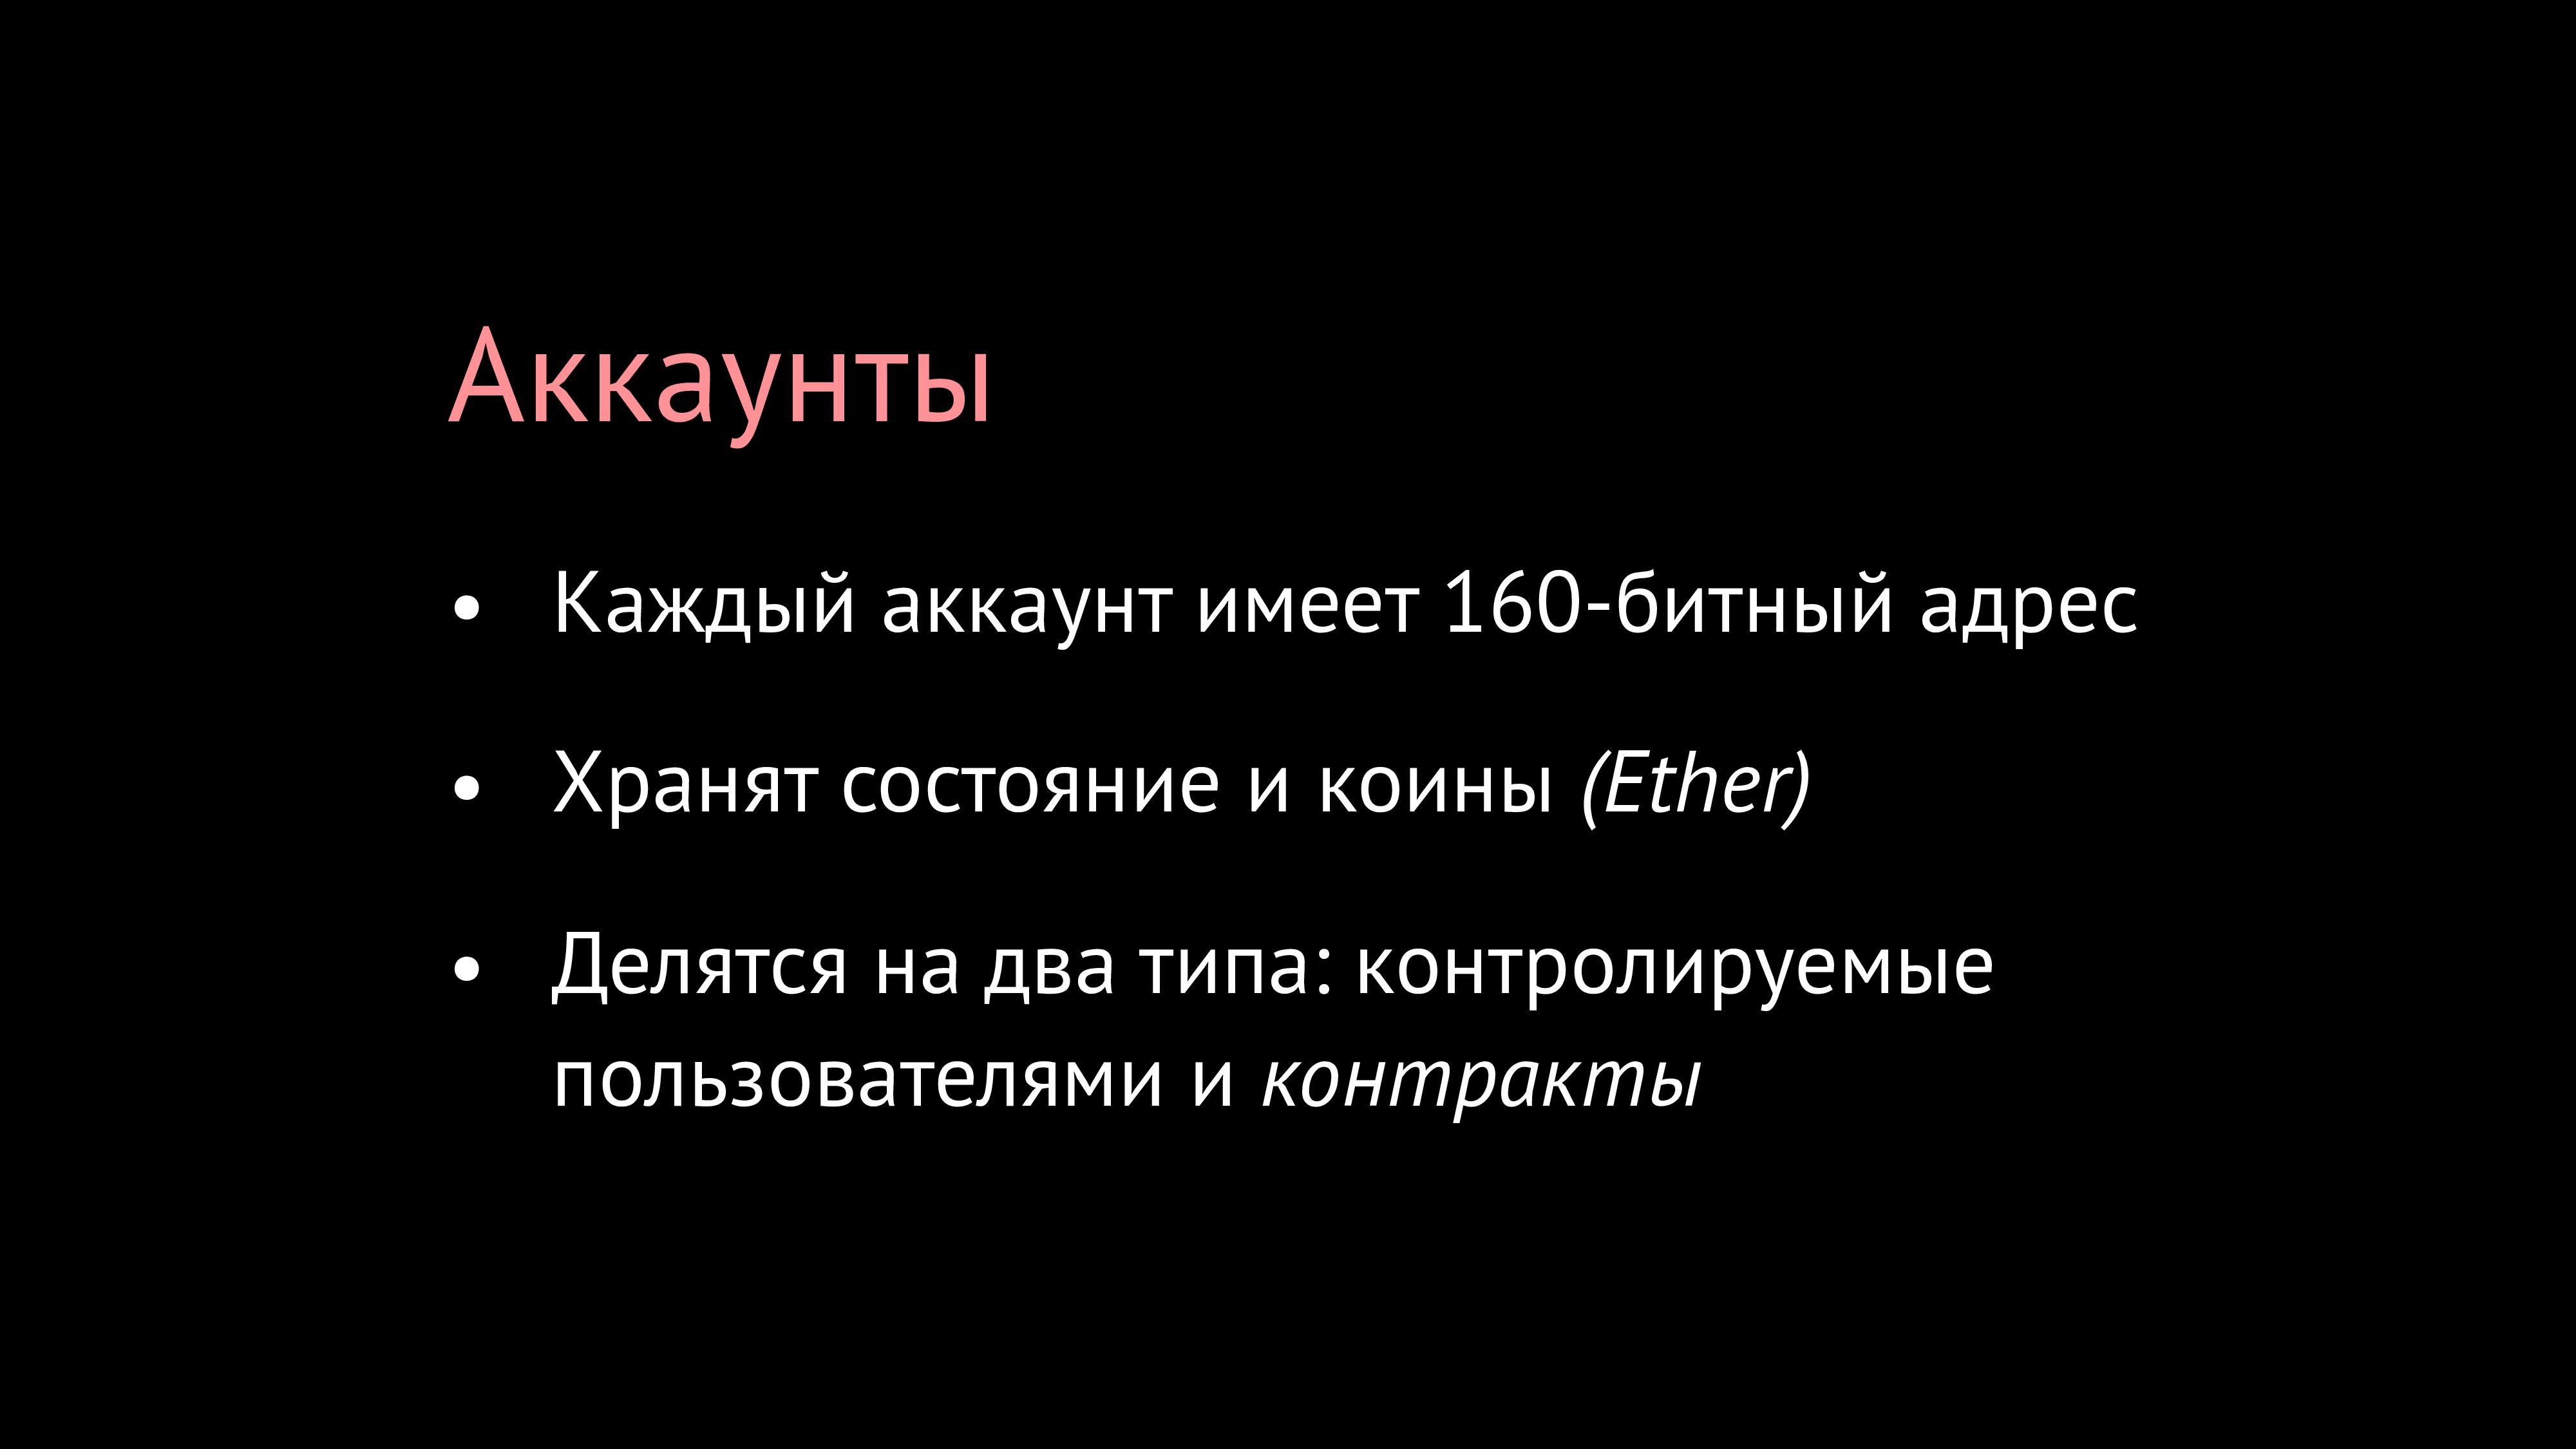 Аккаунты • Каждый аккаунт имеет 160-битный адре...